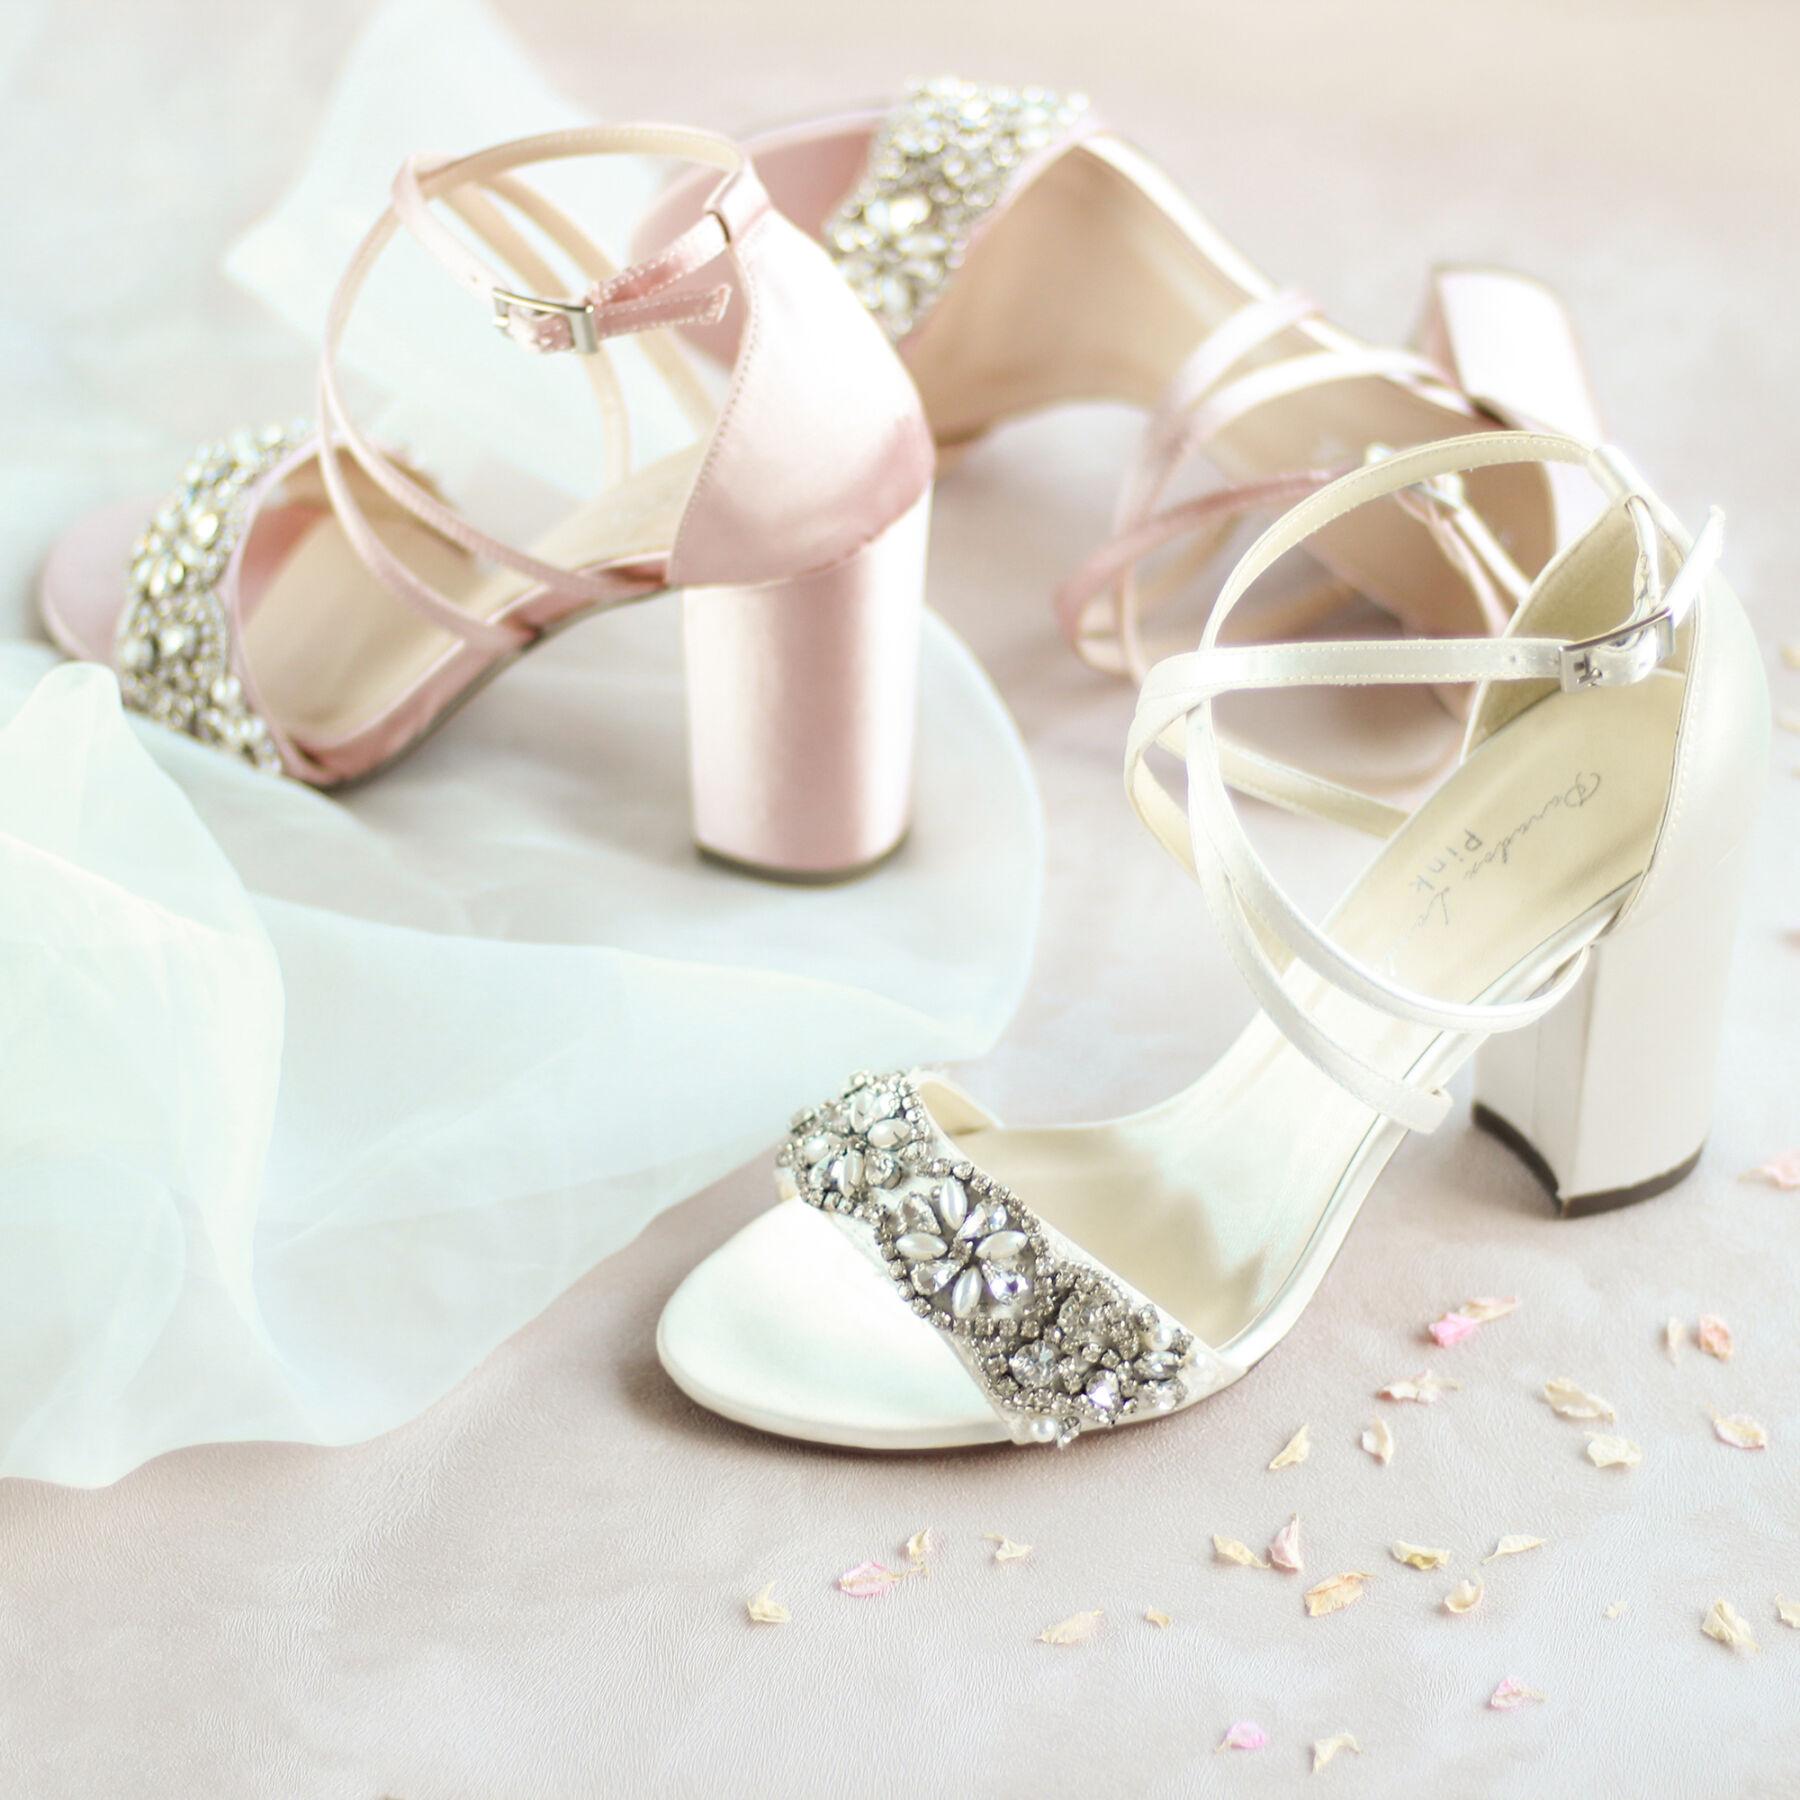 Paradox London Modern Affordable Stylish Wedding Shoes